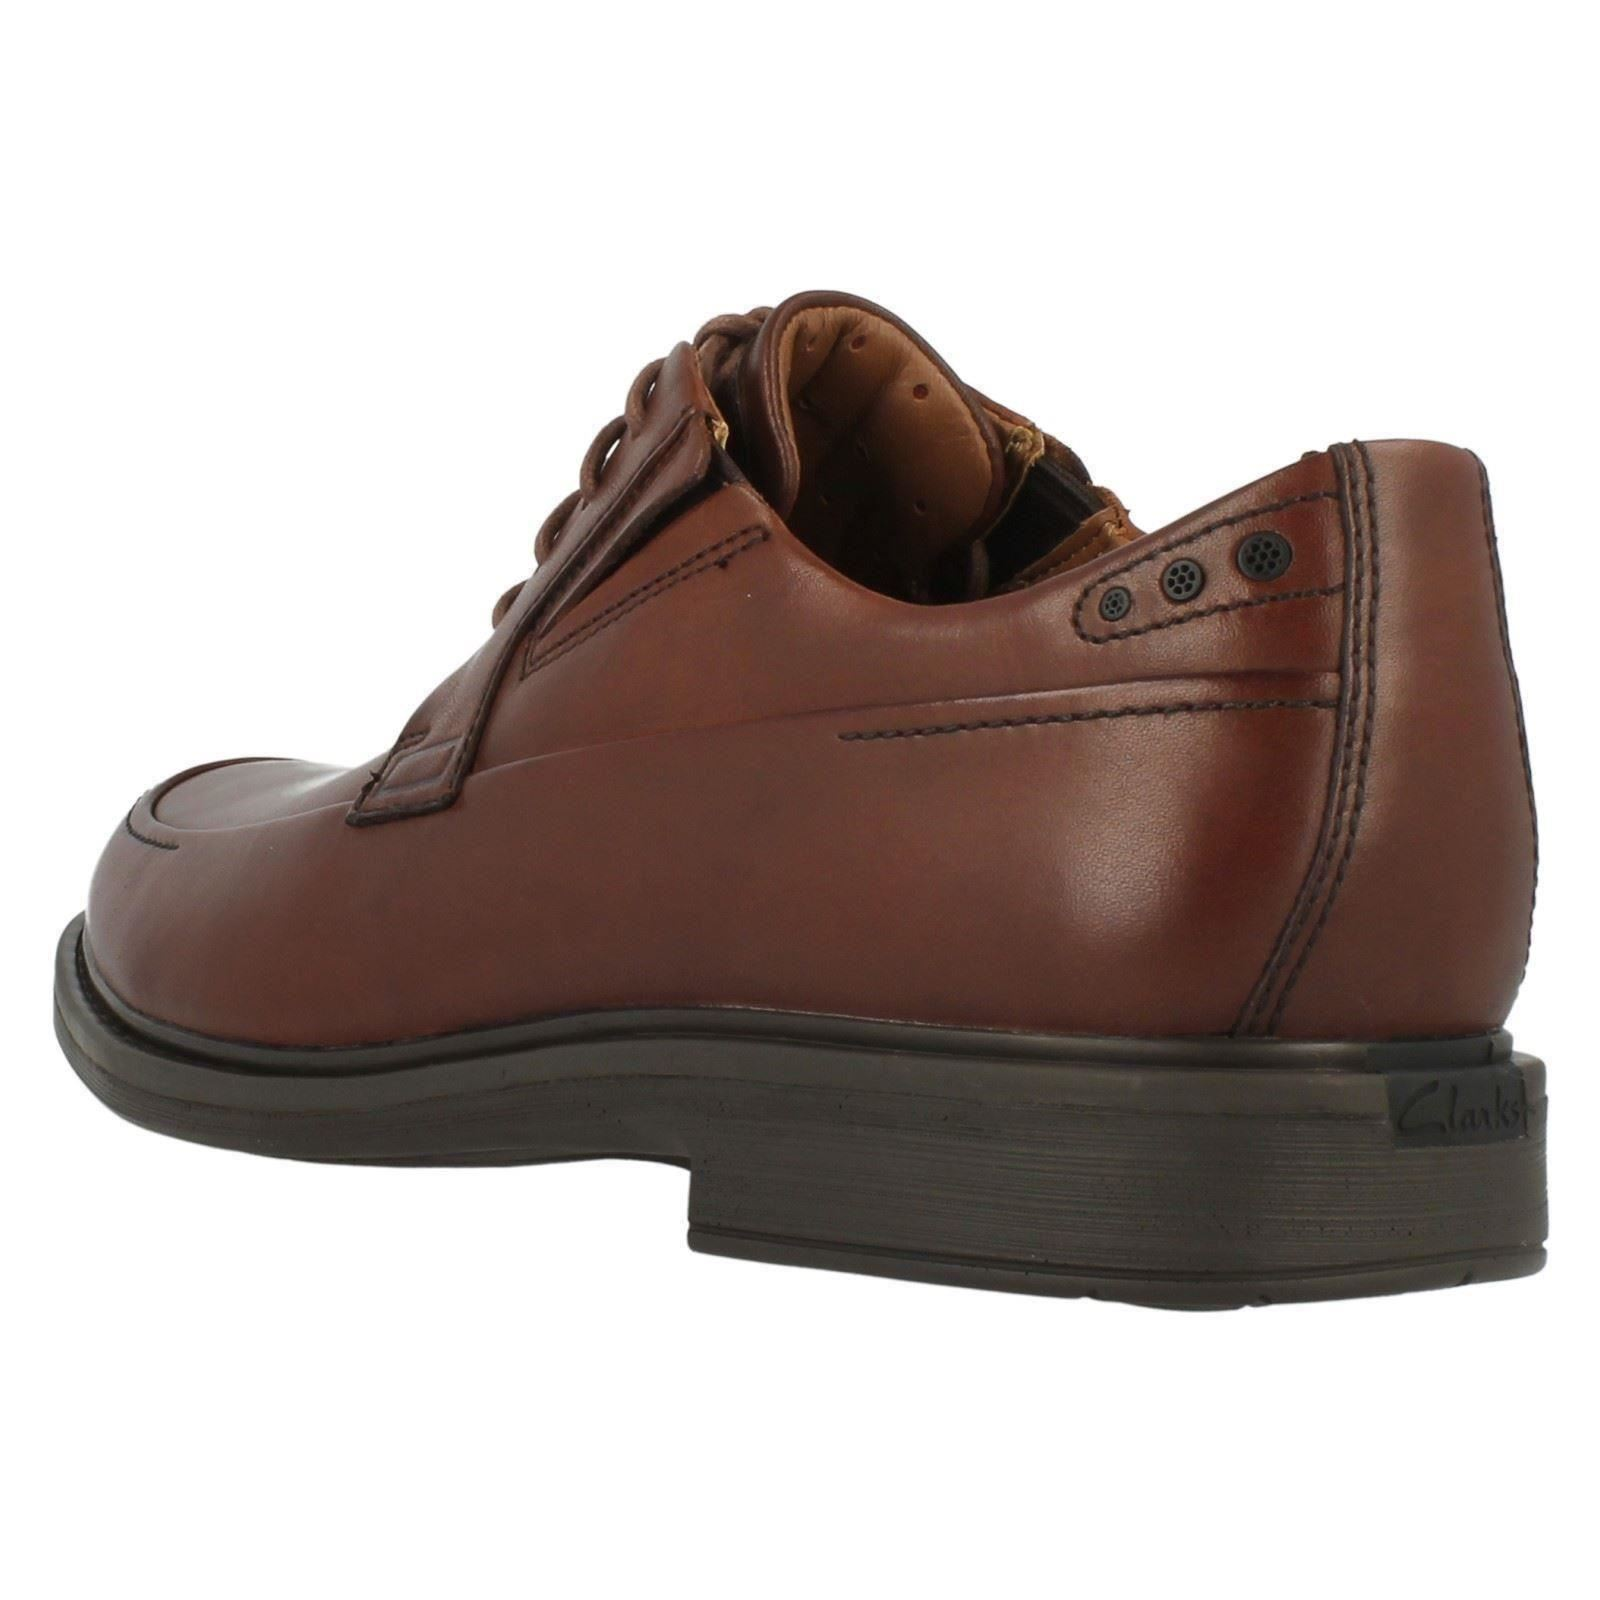 formales marrón zapatos Drexlar hombre Clarks para Dark Tan Time q8tSEpn